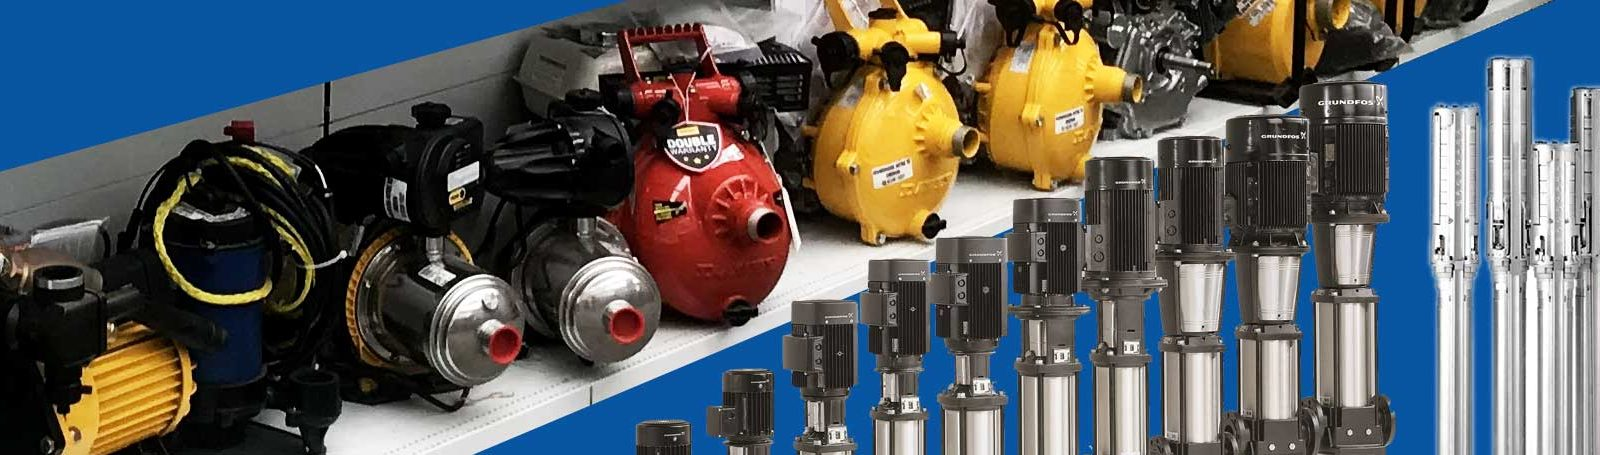 Darling Irrigation Pump Equipment